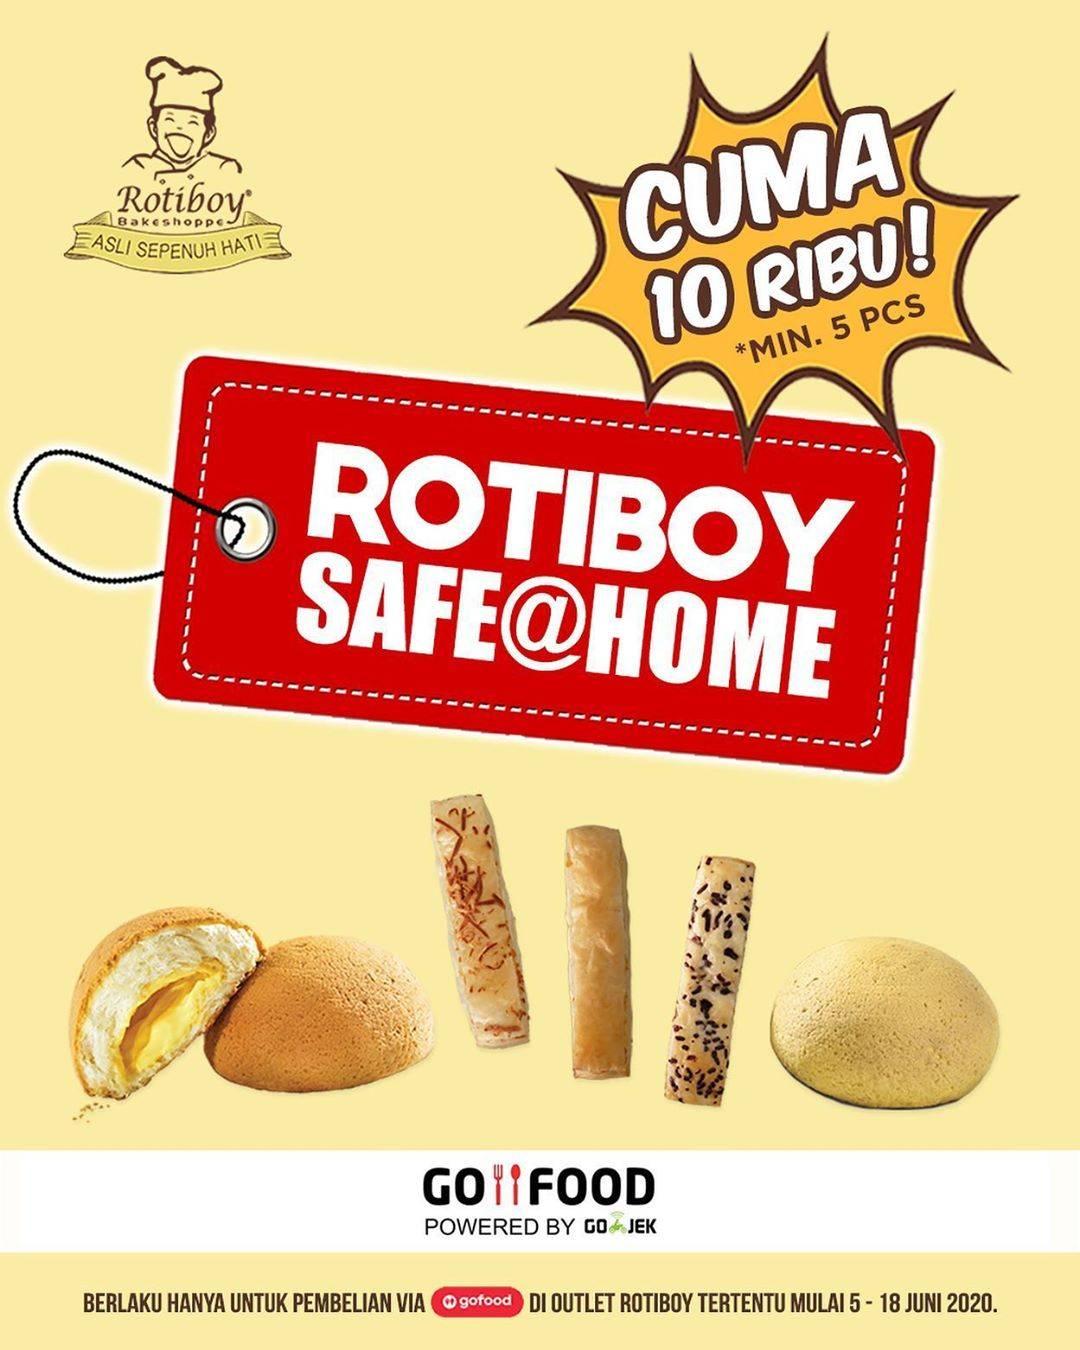 Diskon Promo Roti Boy Paket Safe at Home Hanya Rp. 10.000 Untuk Pemesanan Melalui GoFood